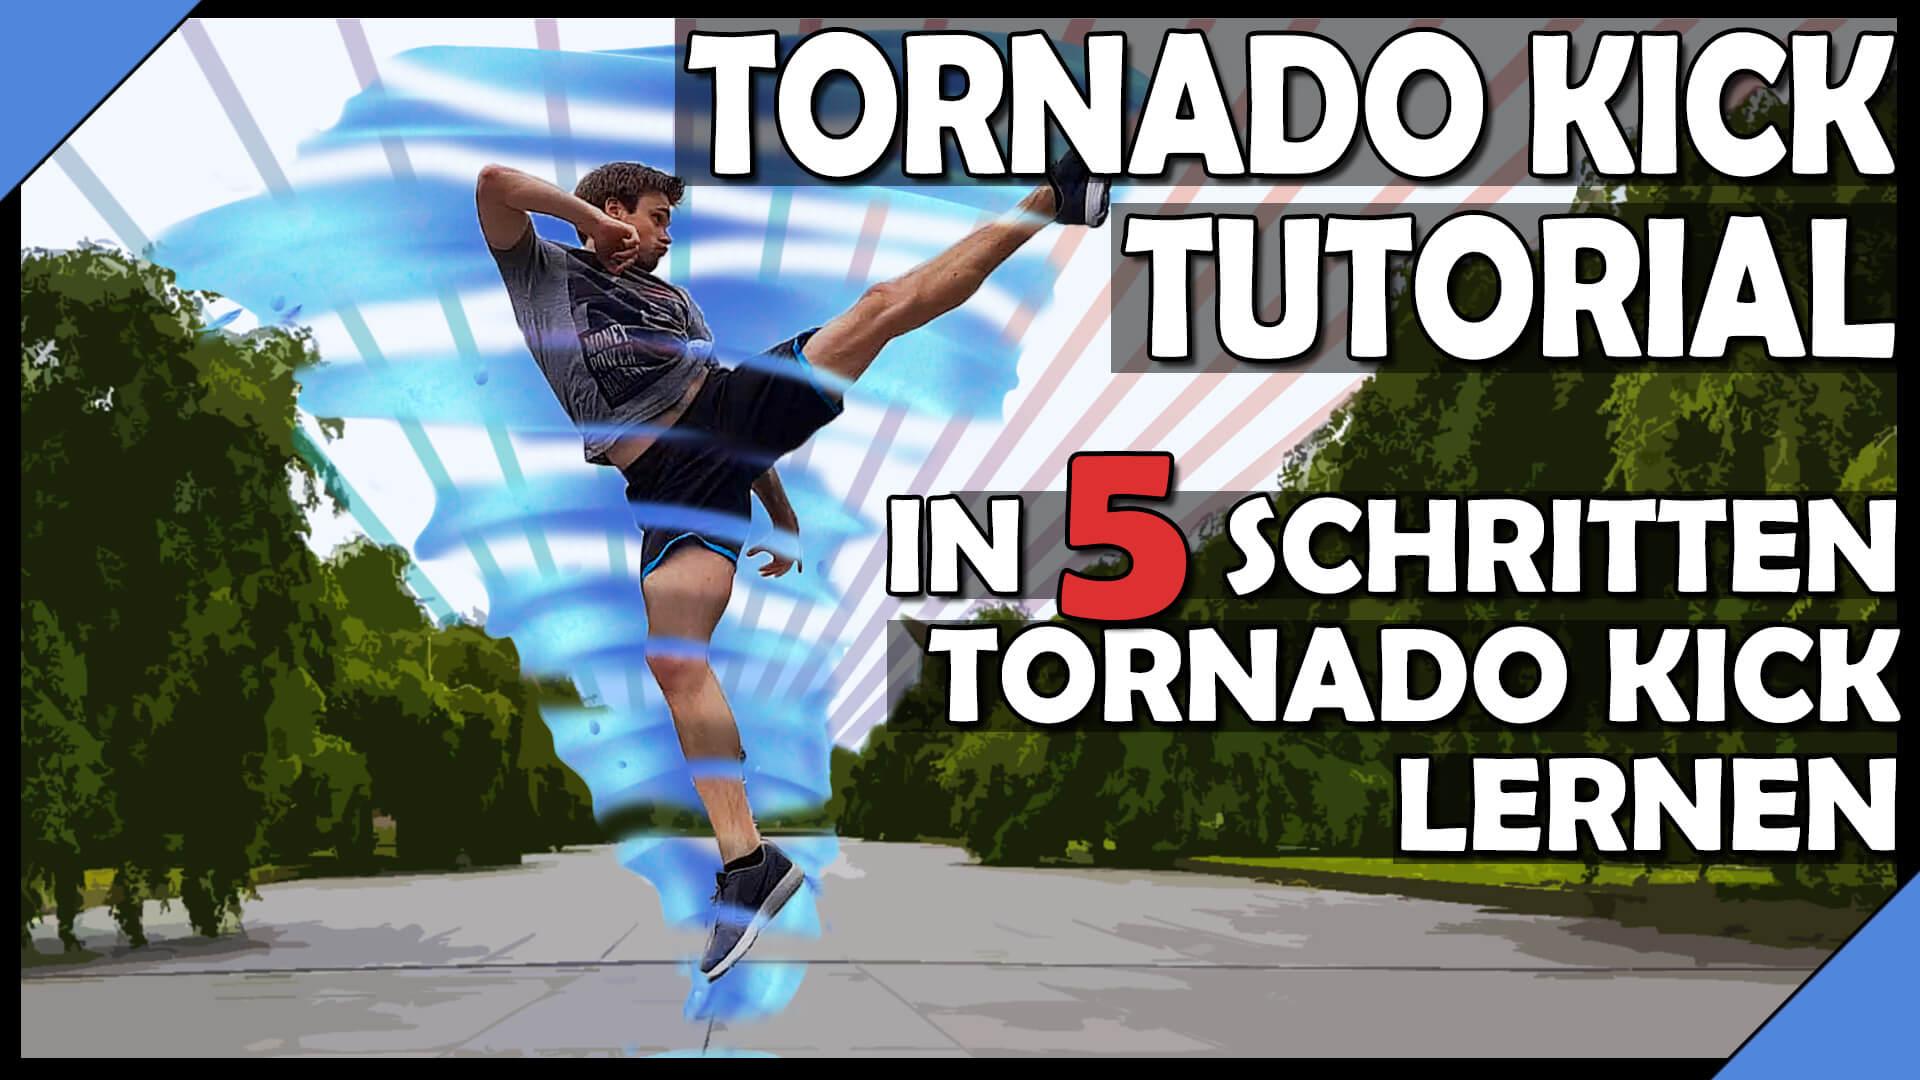 tornado kick lernen tutorial thumbnail